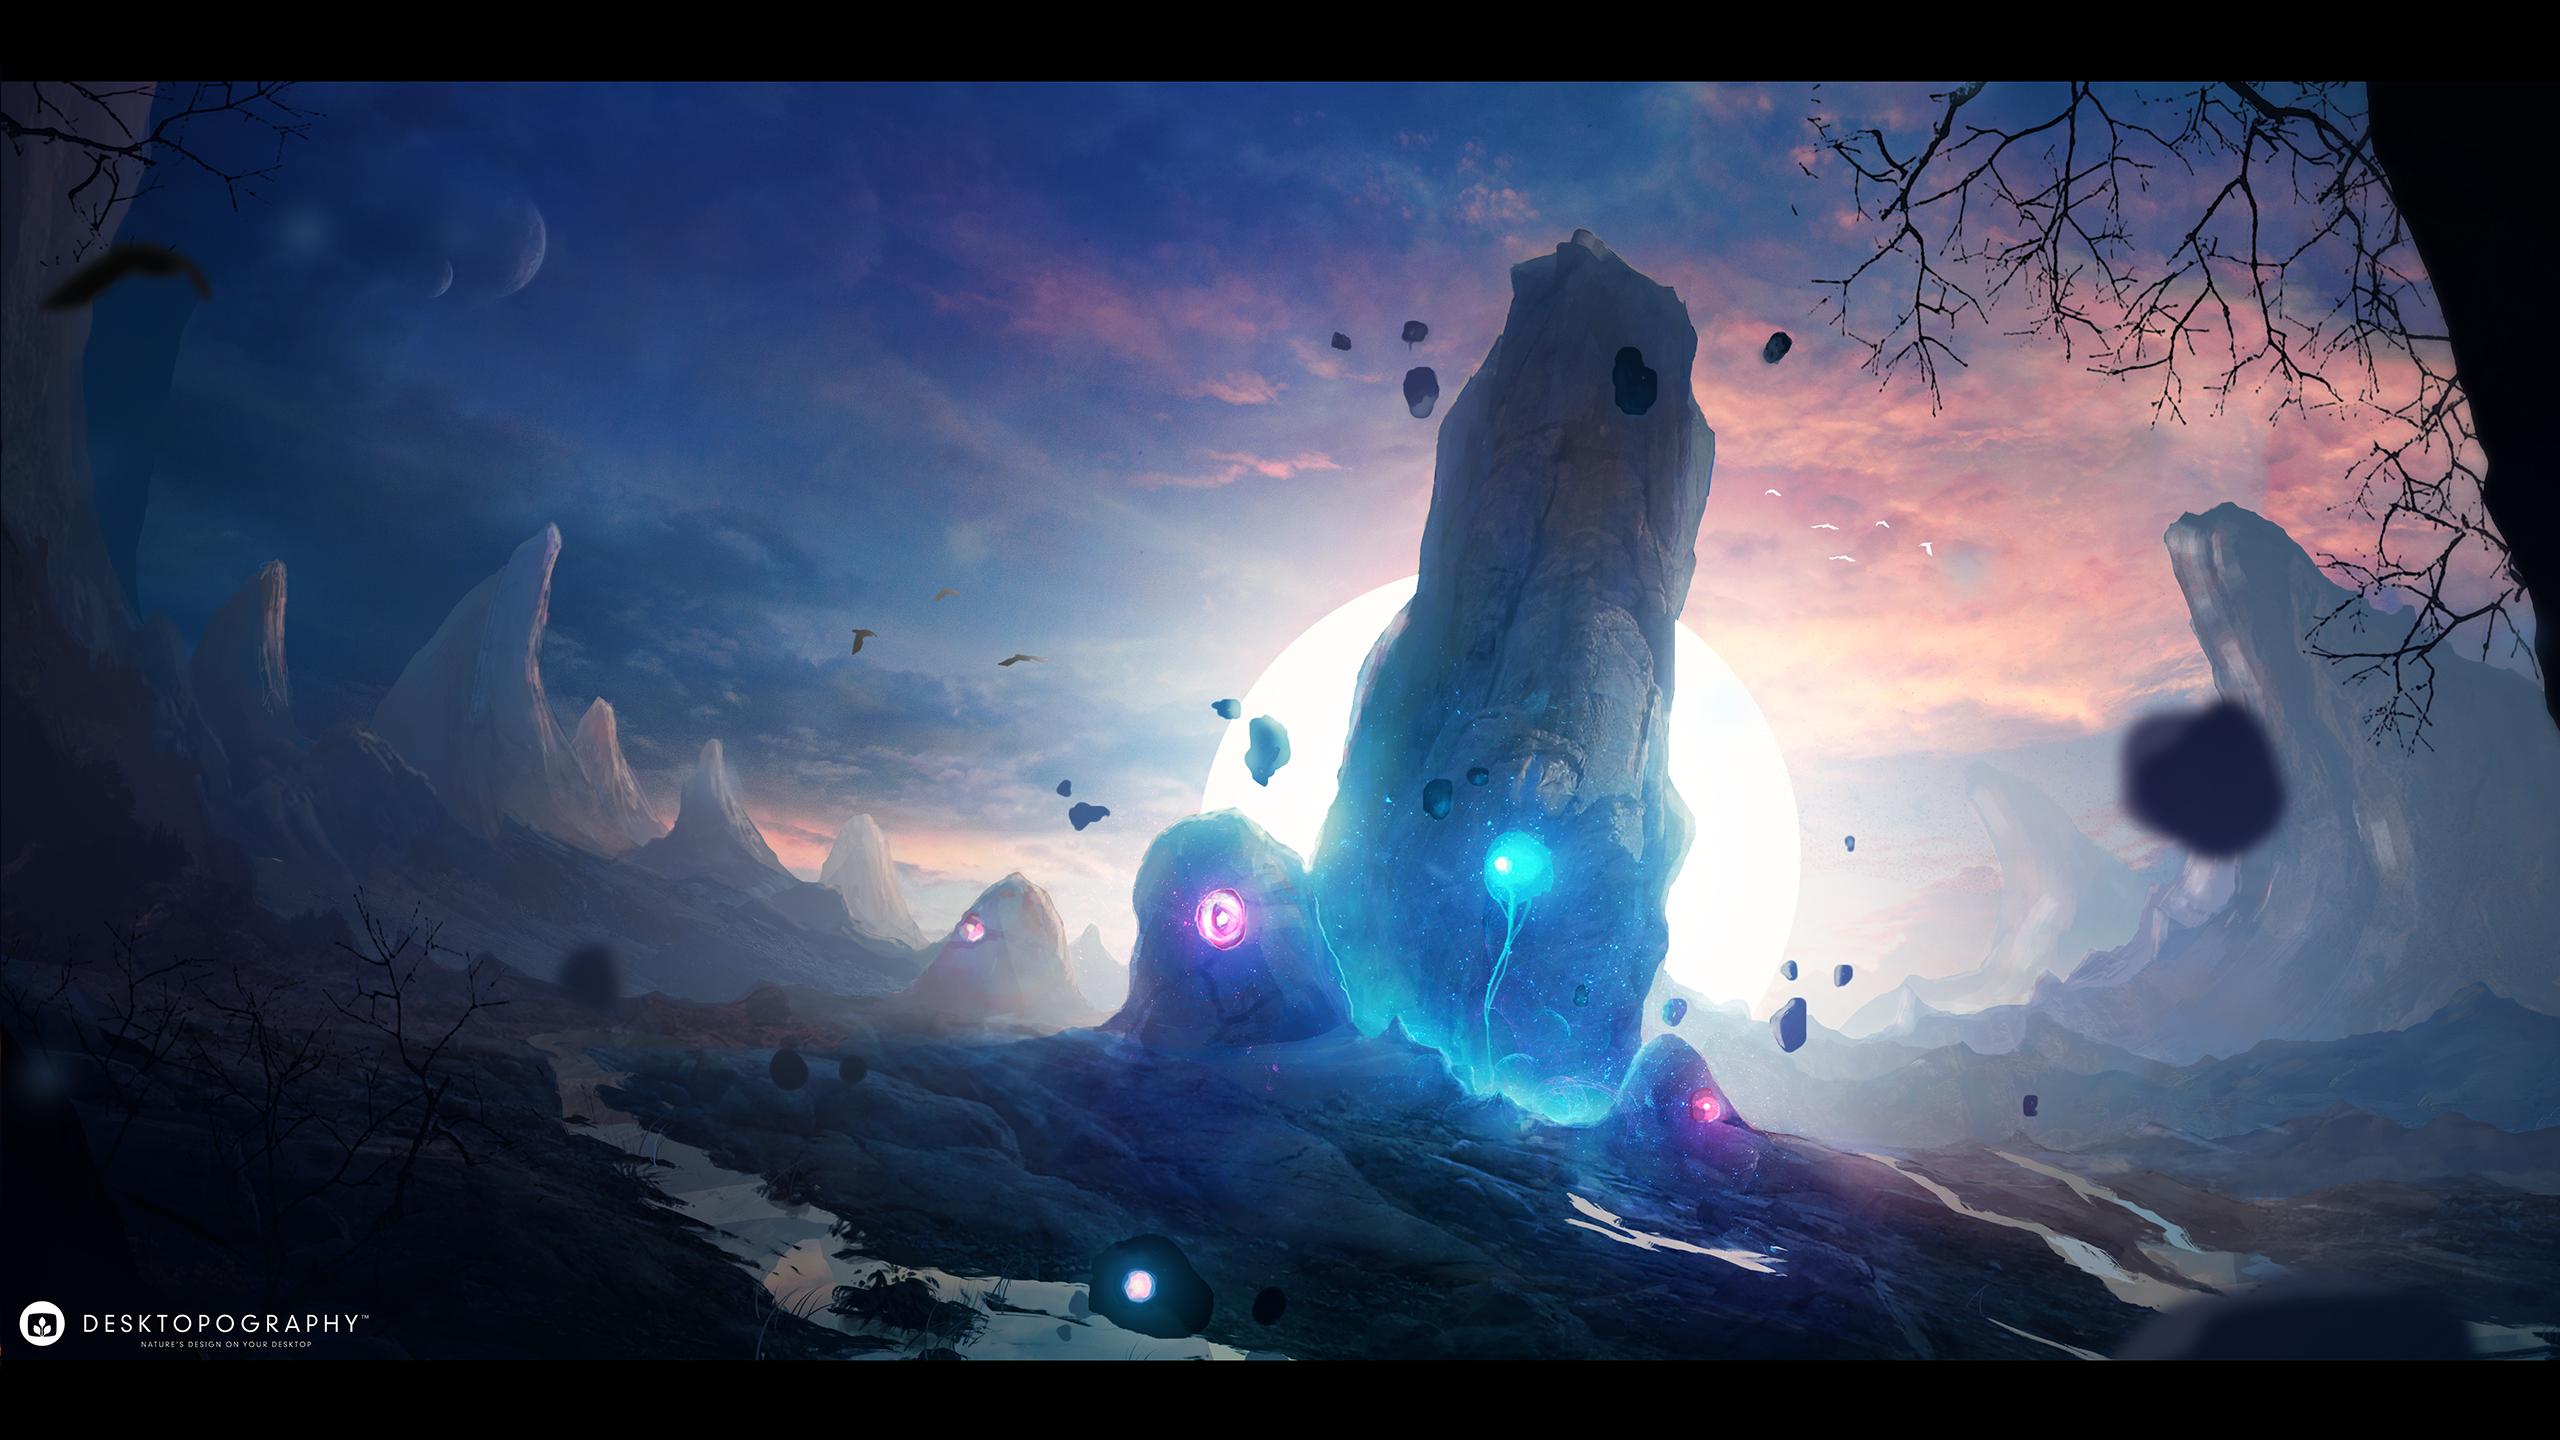 General 2560x1440 Desktopography space science fiction digital planet fantasy art landscape